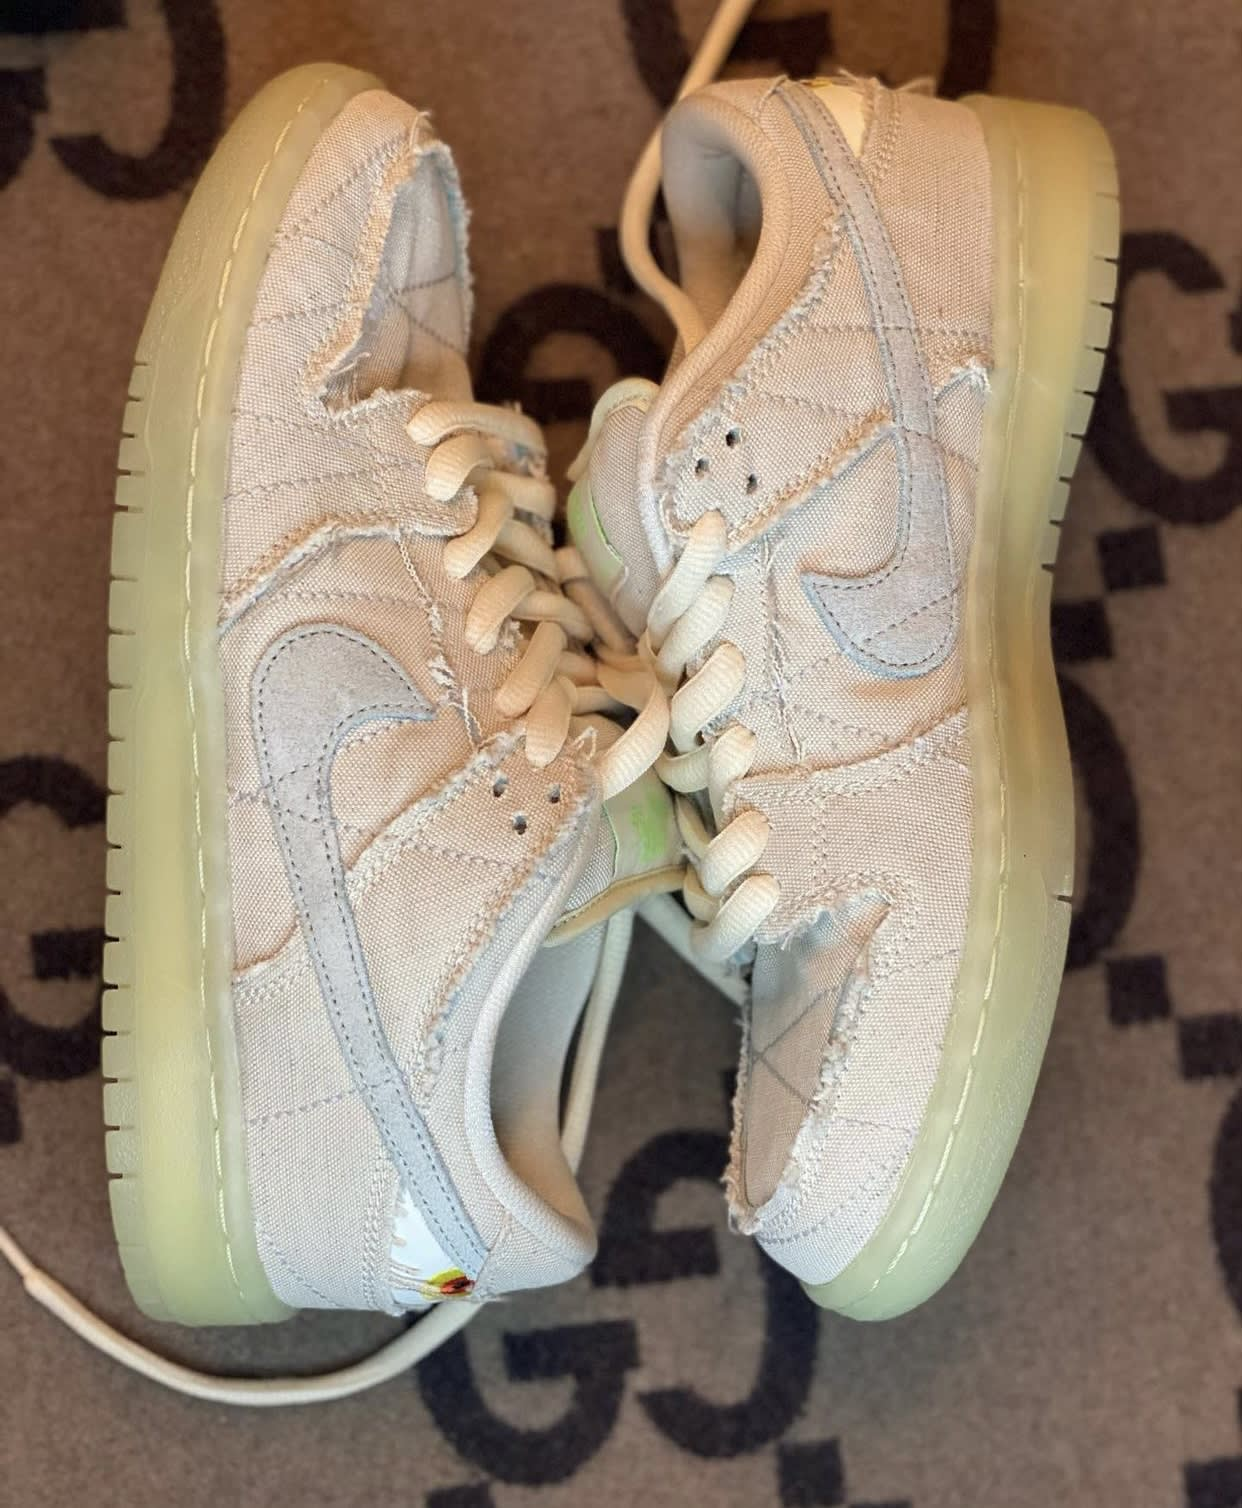 Nike SB Dunk Low Mummy Halloween DM0774-111 Pair